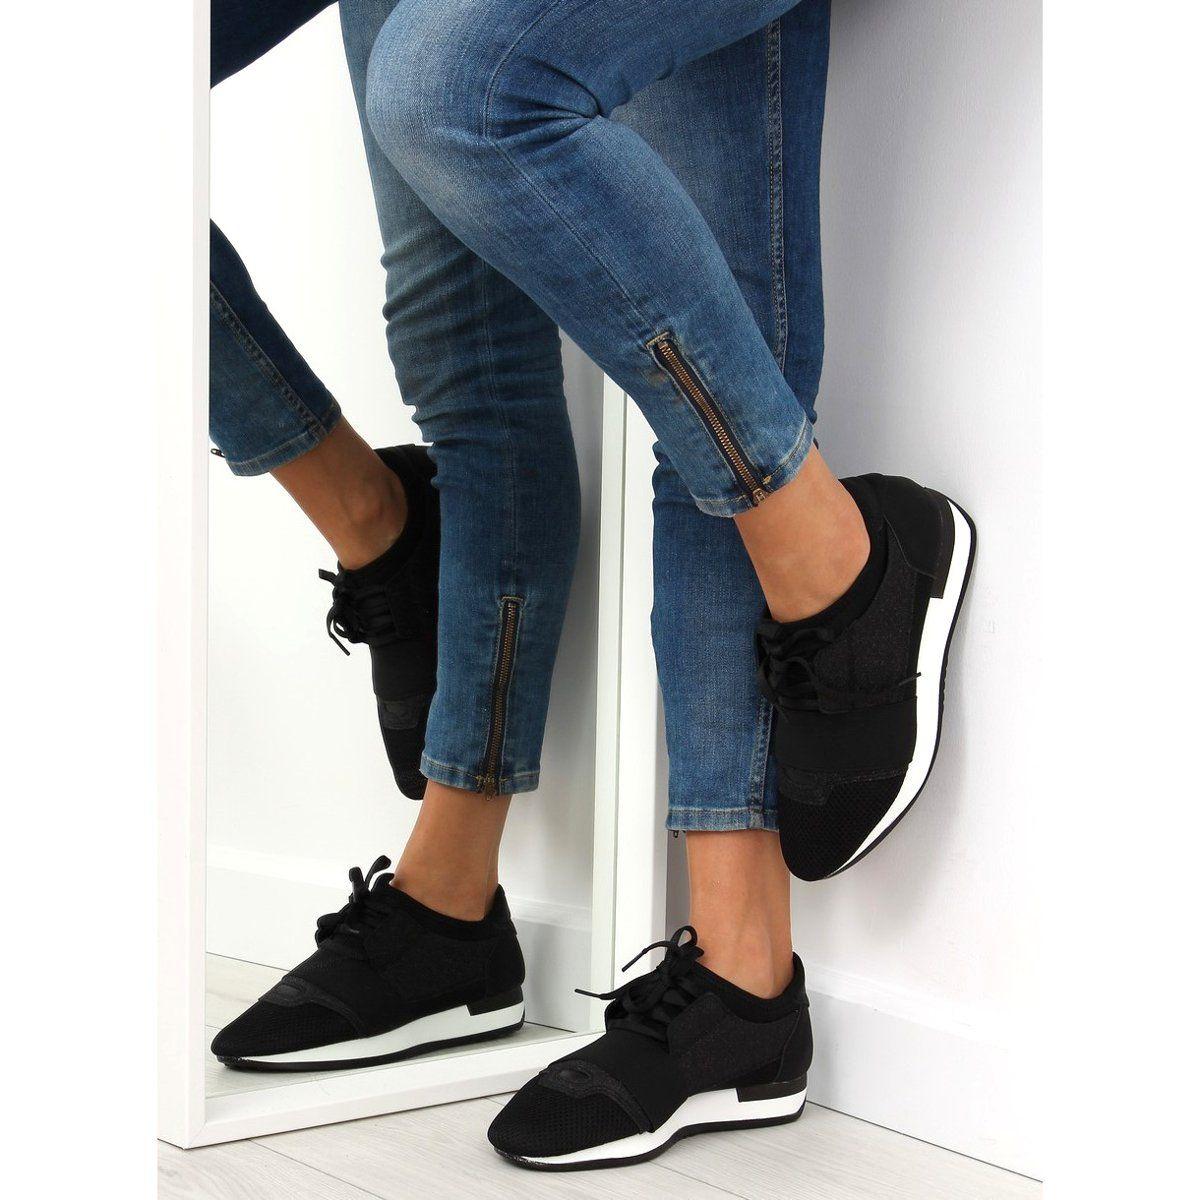 Buty Sportowe Czarne K1x063 Black Szare Suede Sneakers Sneakers Black Thick Tights